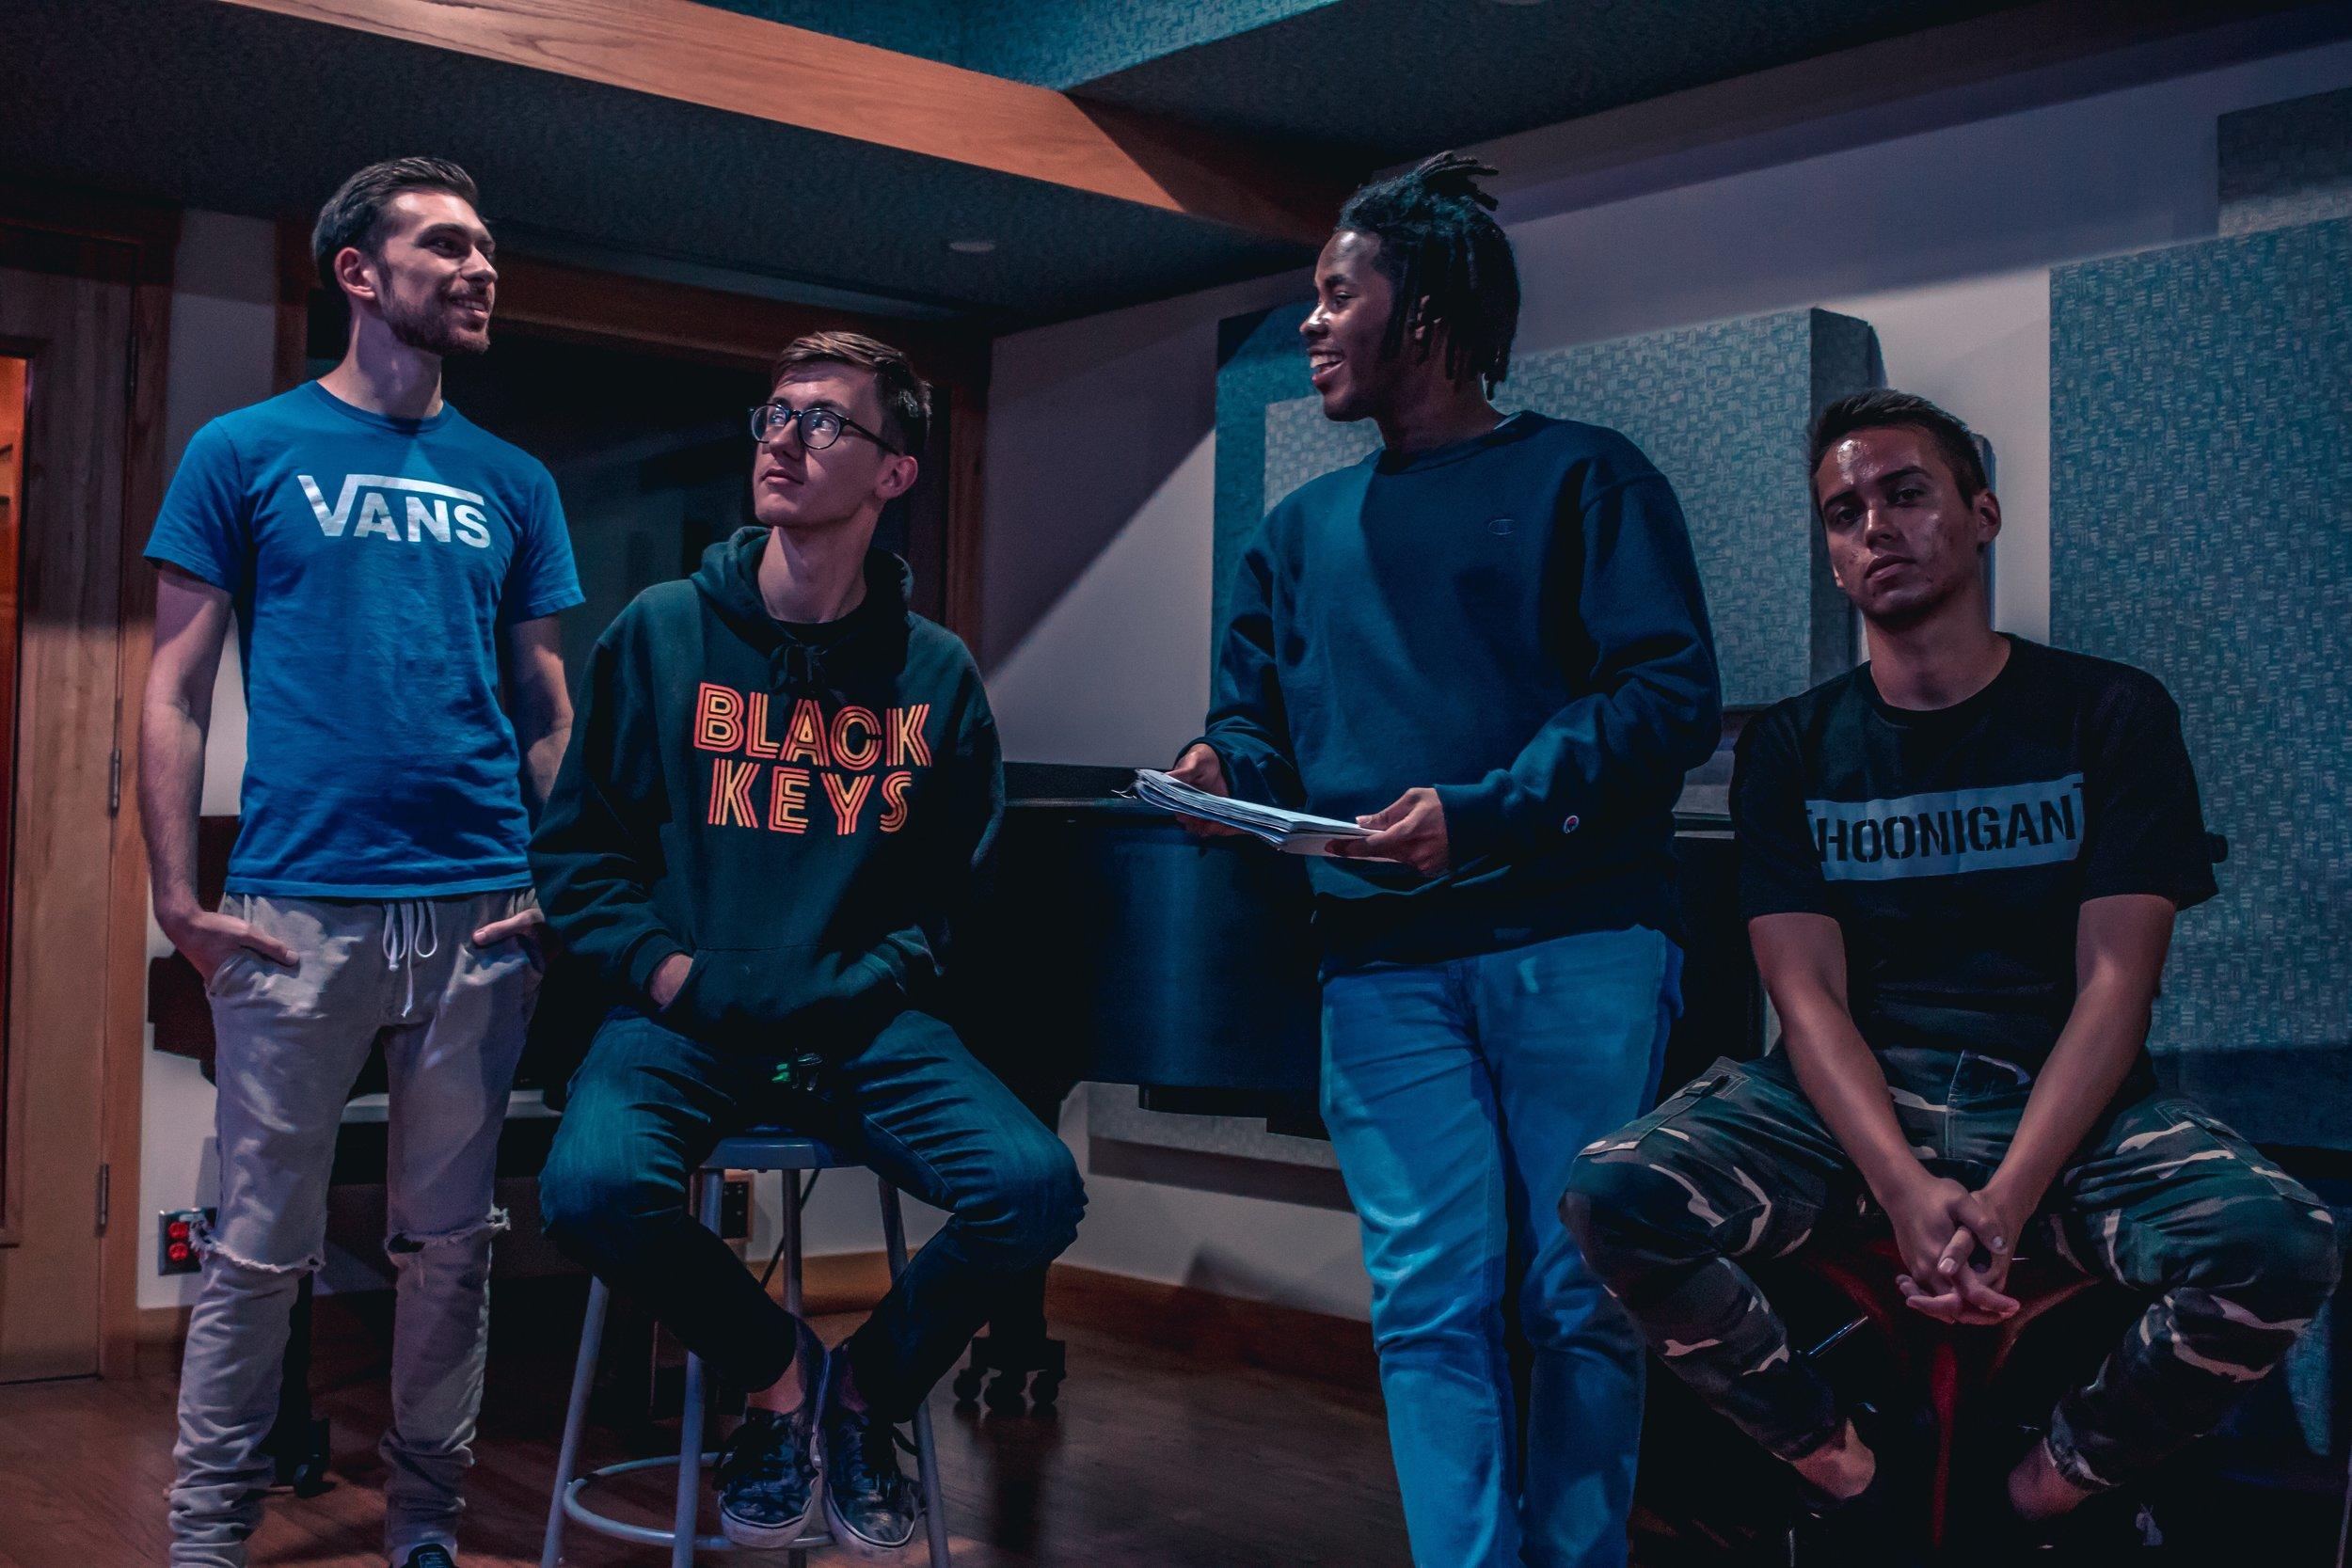 Grand lotus - new music sUMMER 2019